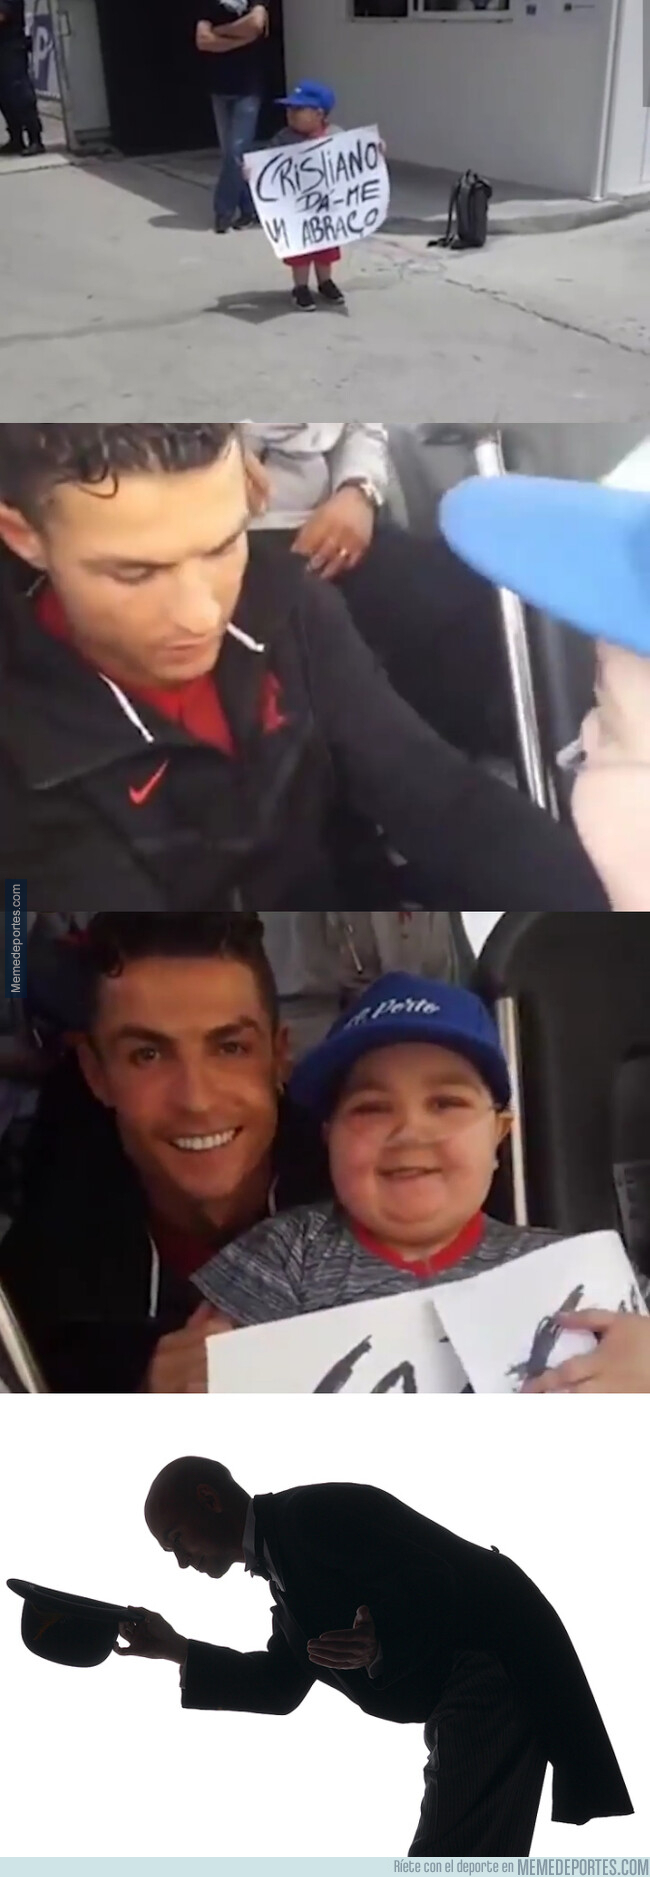 1077546 - Cristiano subió al autobús de Portugal a este chico que quería un abrazo suyo #Respect